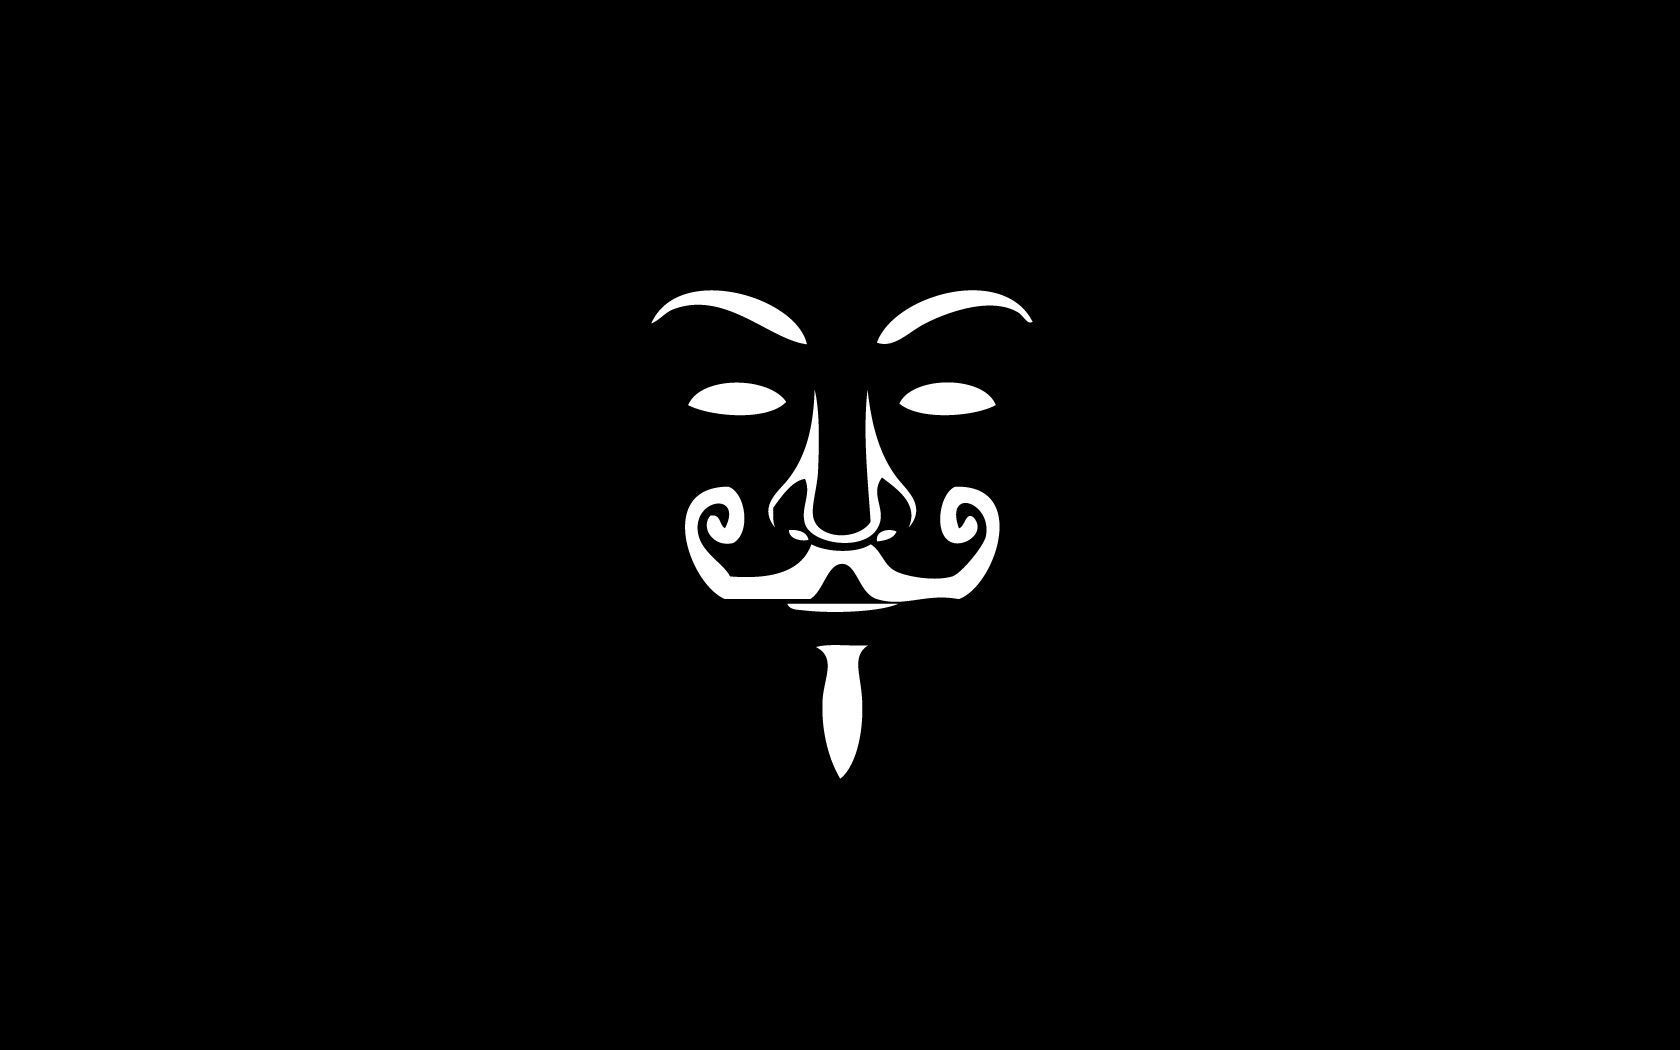 Black Anonymous Mask Wallpaper Opera Wallpapers